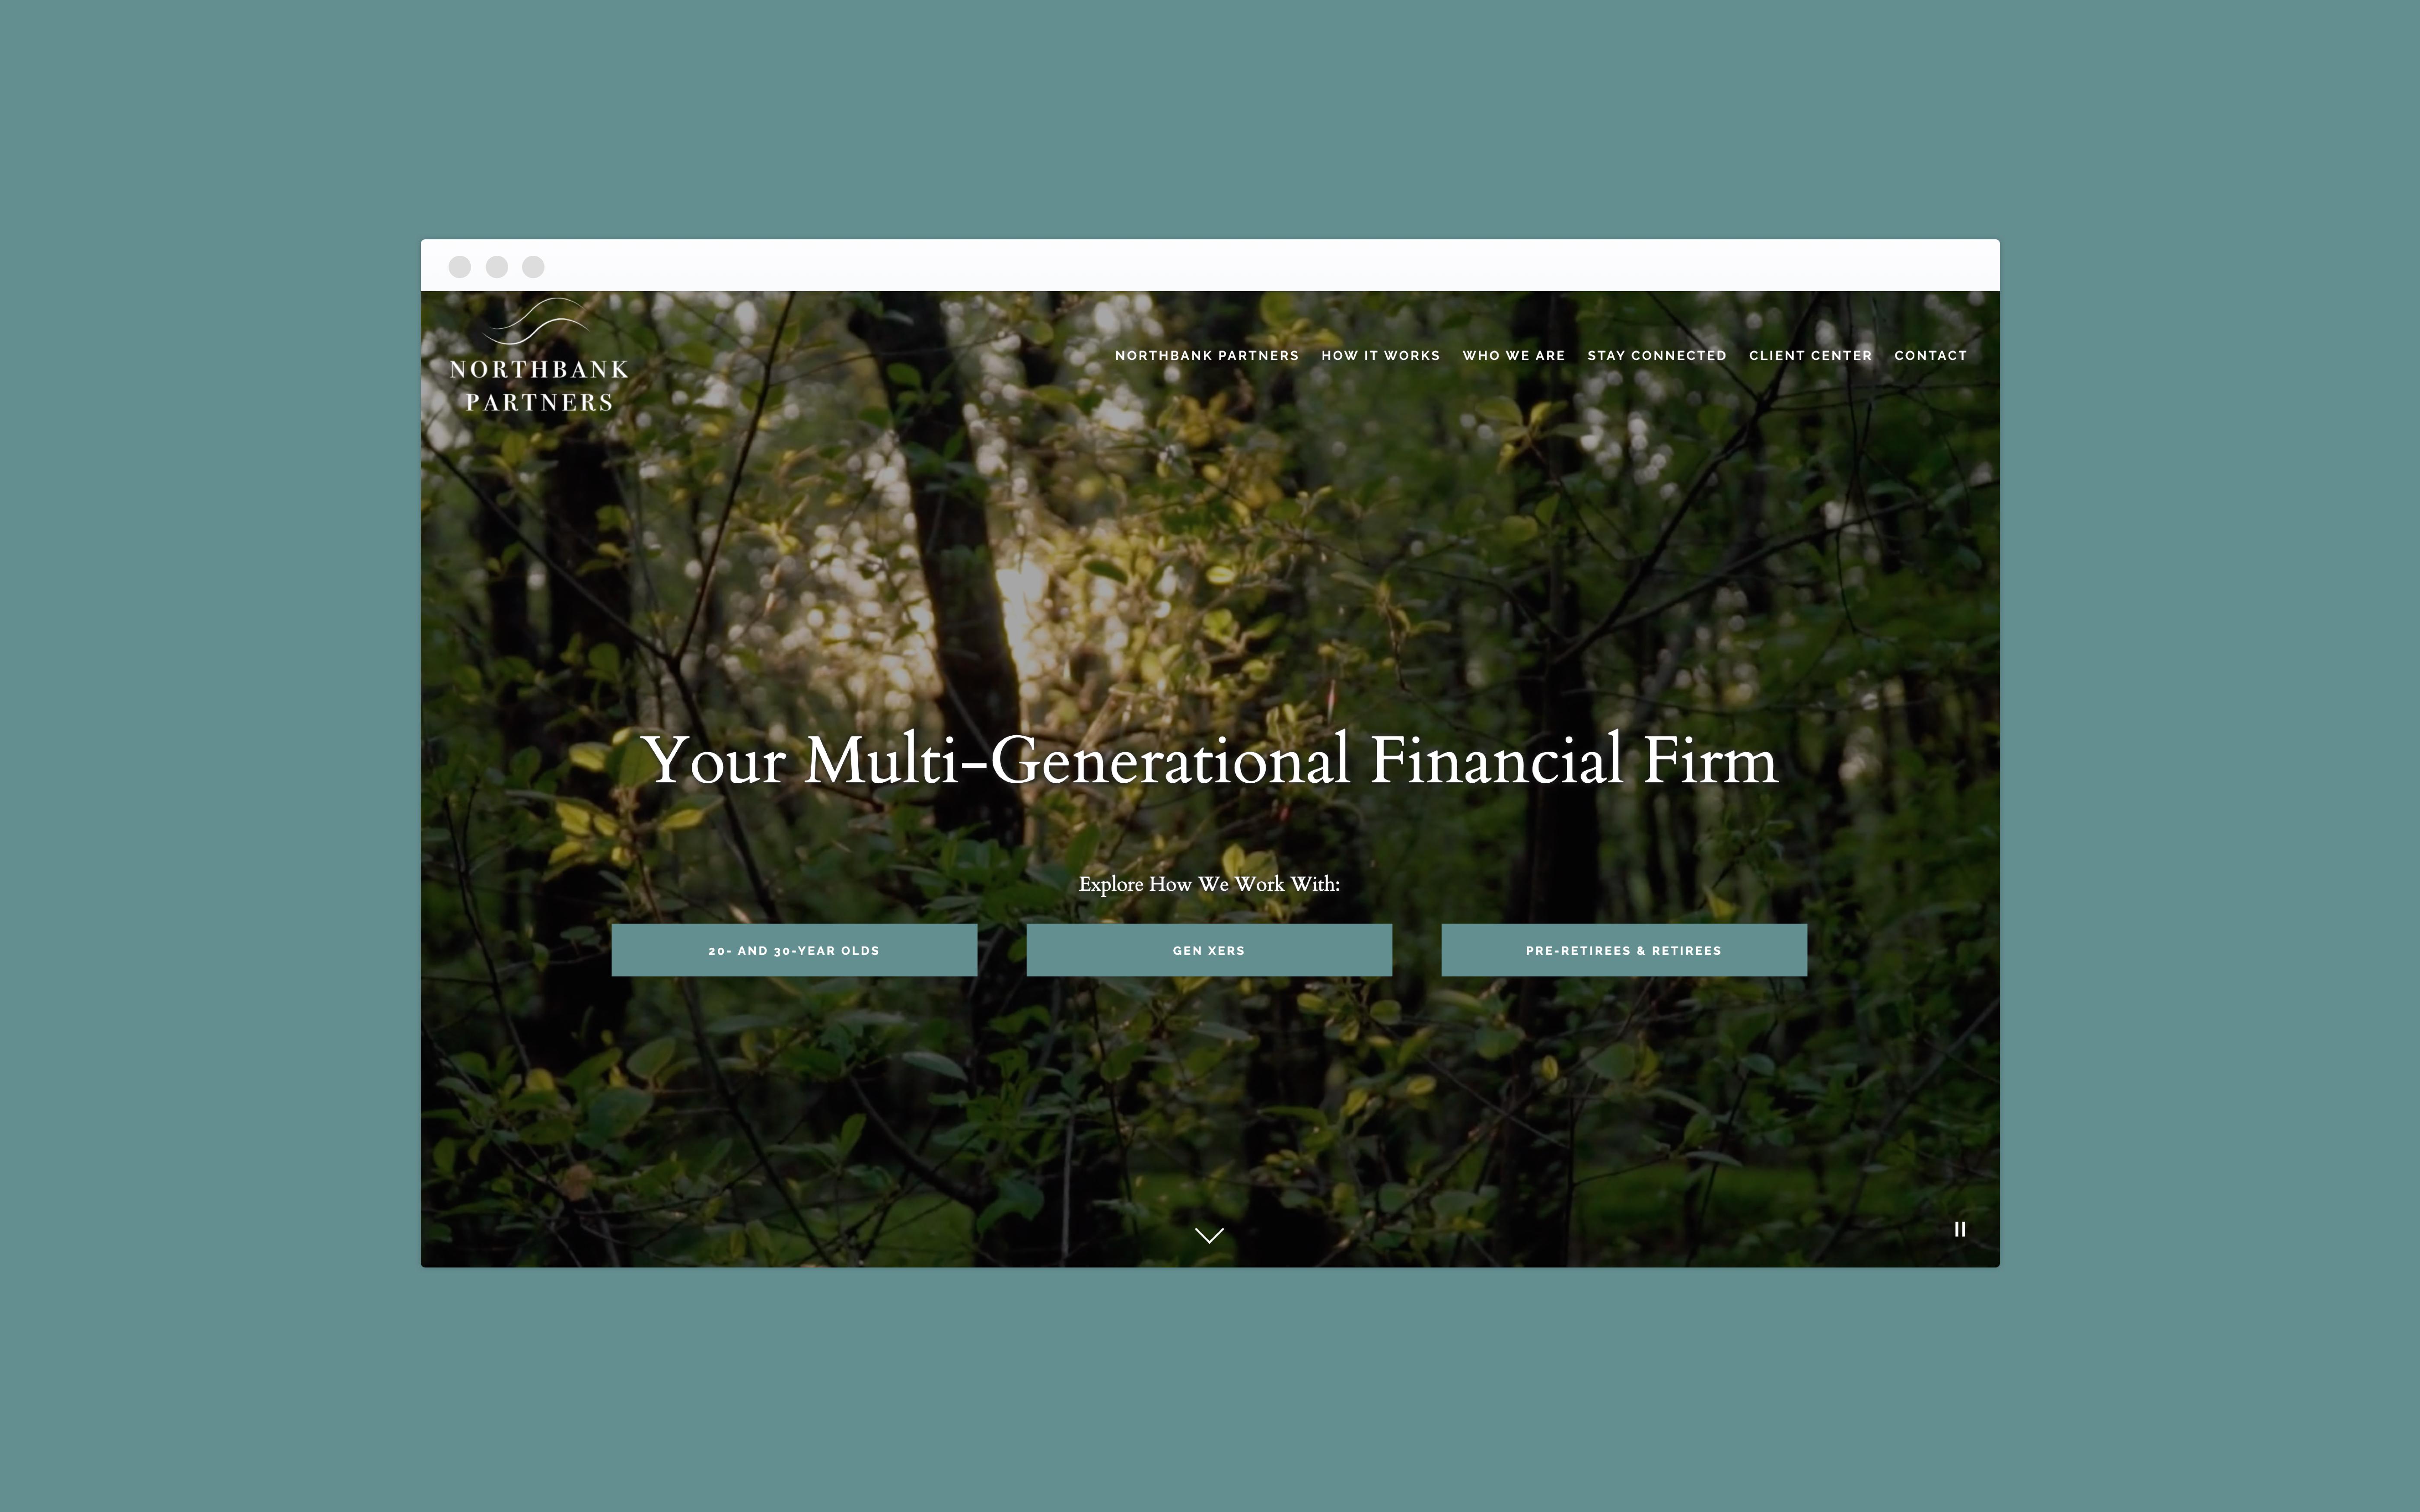 Northbank Partners